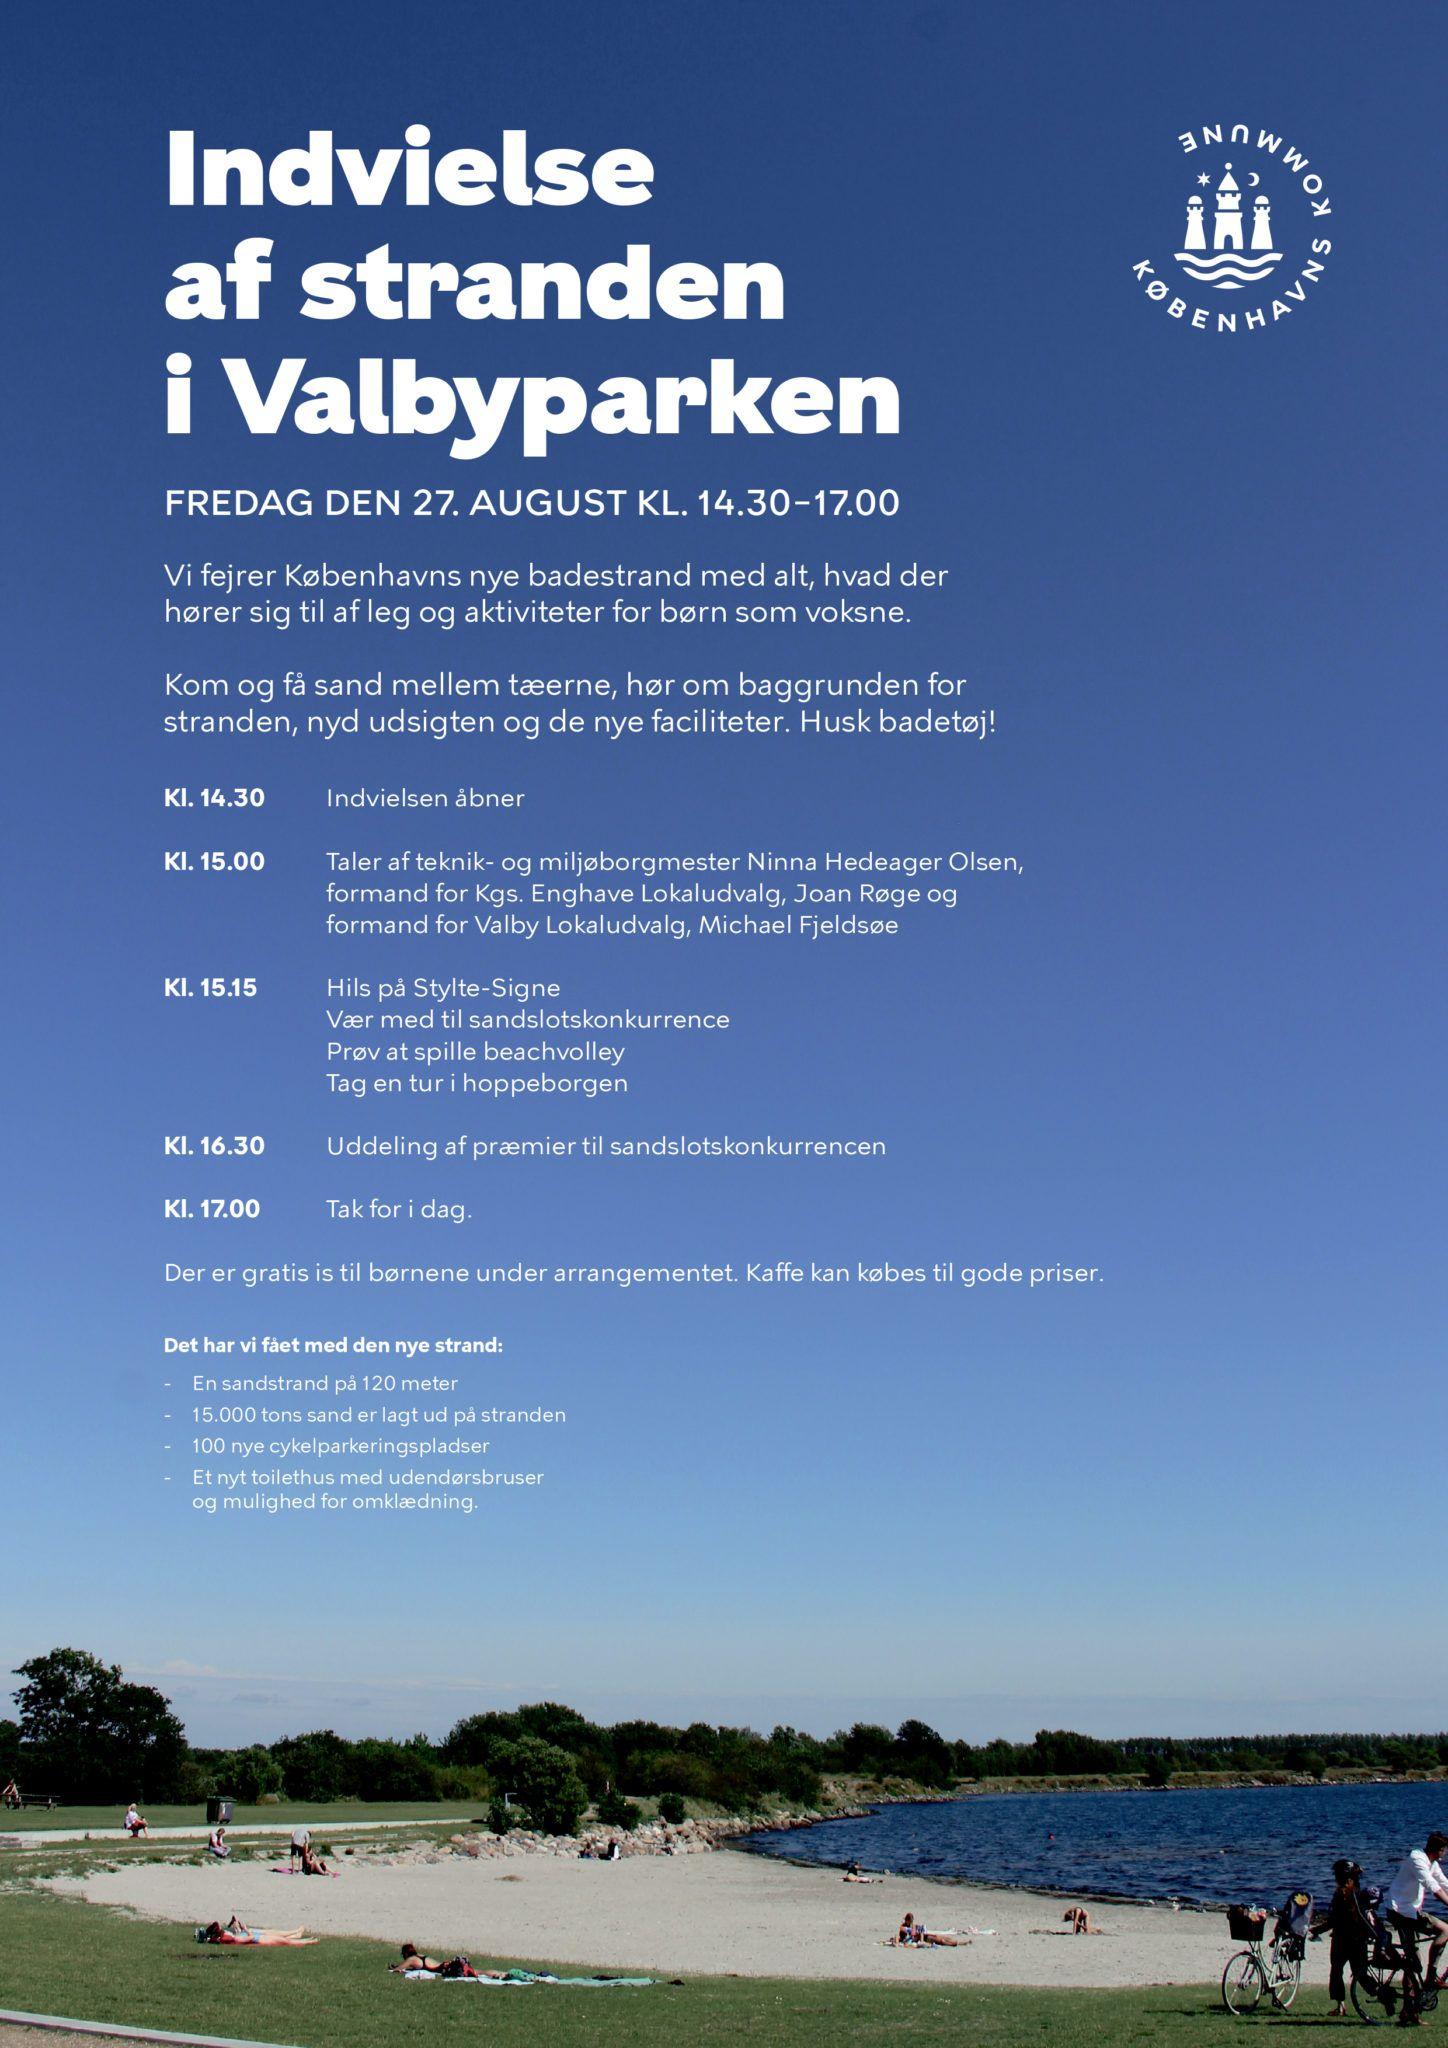 Valbyparken_badestrand_indvielse_final_A4